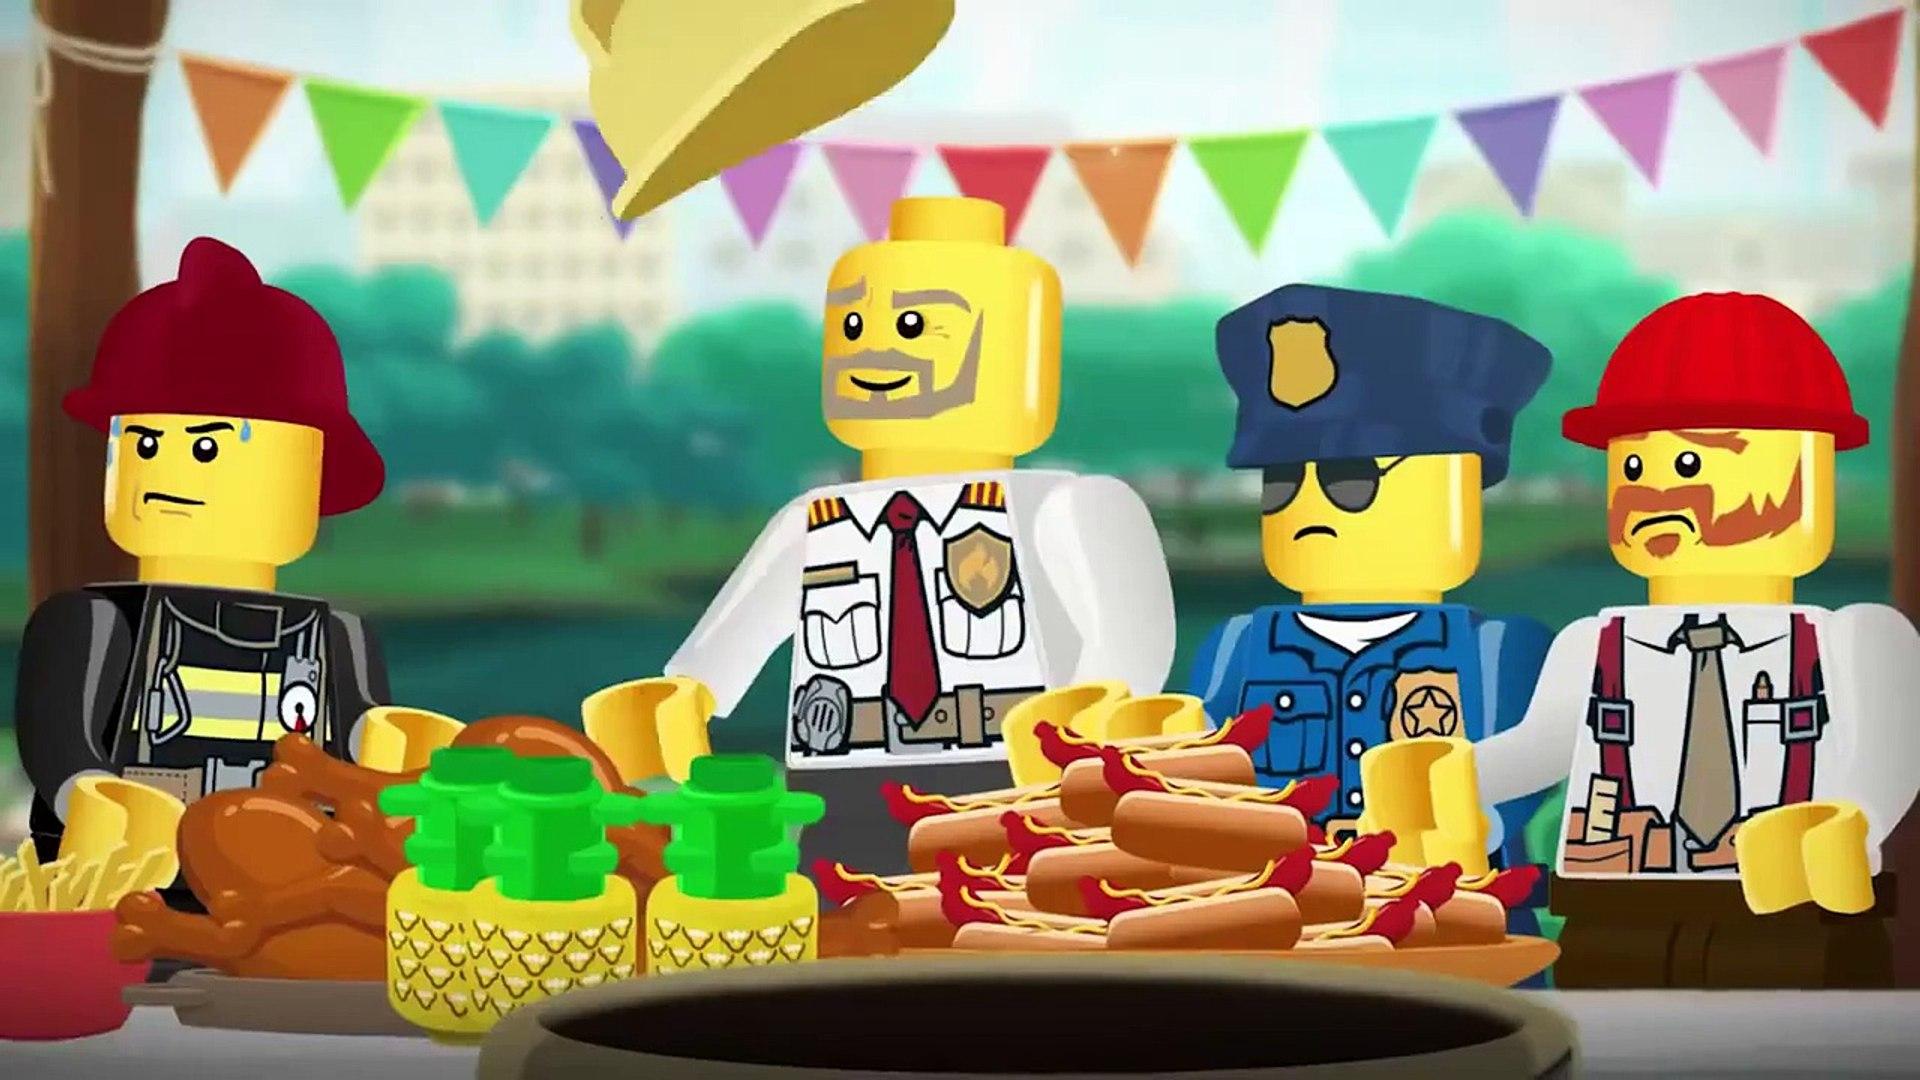 Лего Сити Мэшап Начальник пожарной охраны. LEGO City Movie Mixer Mashup Fire Chief's Day